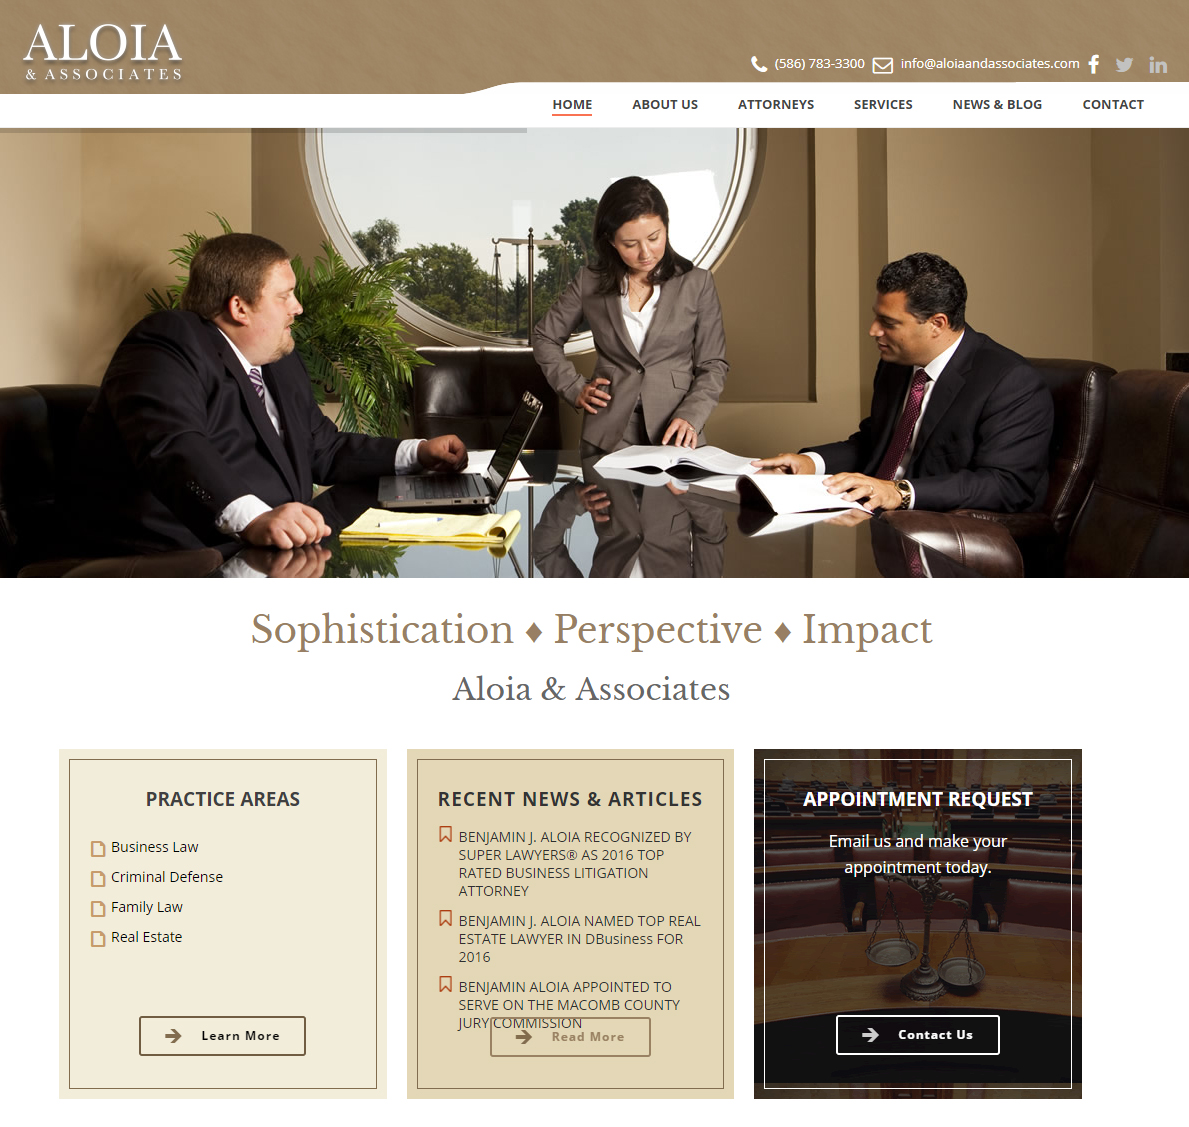 Aloia_Associates